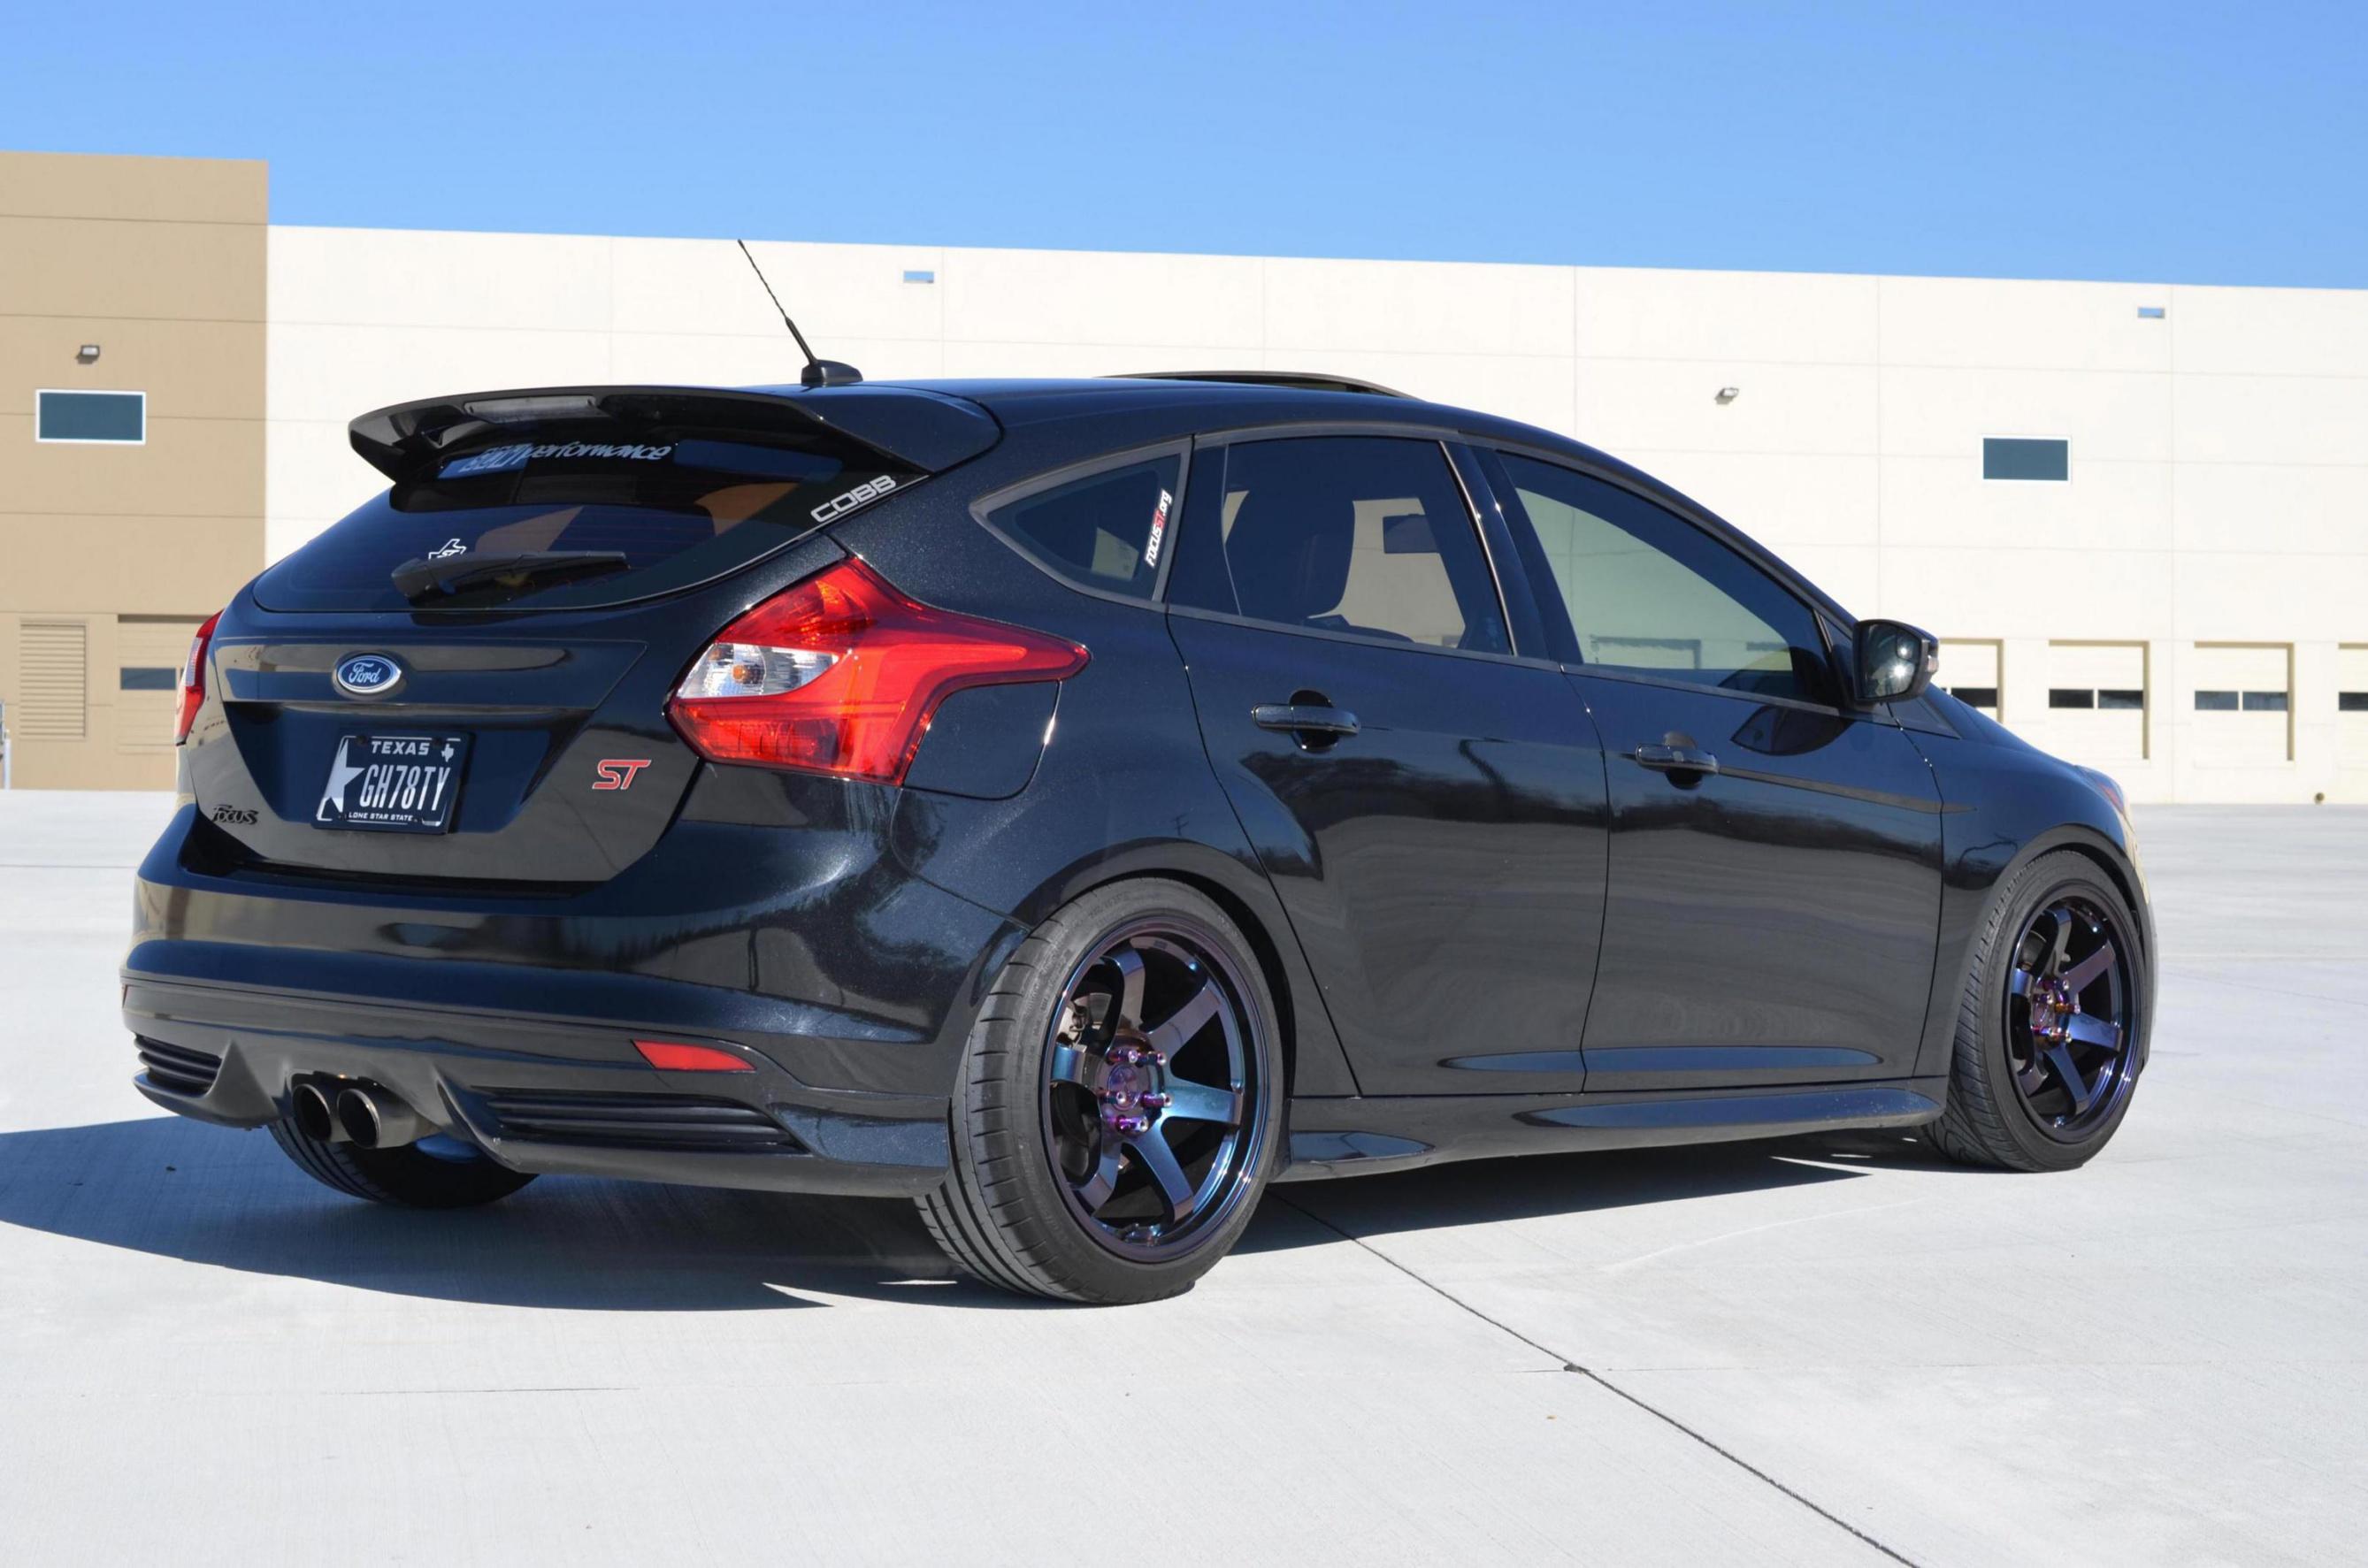 Ford Fiesta Hatchback 2014 >> Rota Grid Chameleon Wheels - Ford Focus Forum, Ford Focus ST Forum, Ford Focus RS Forum